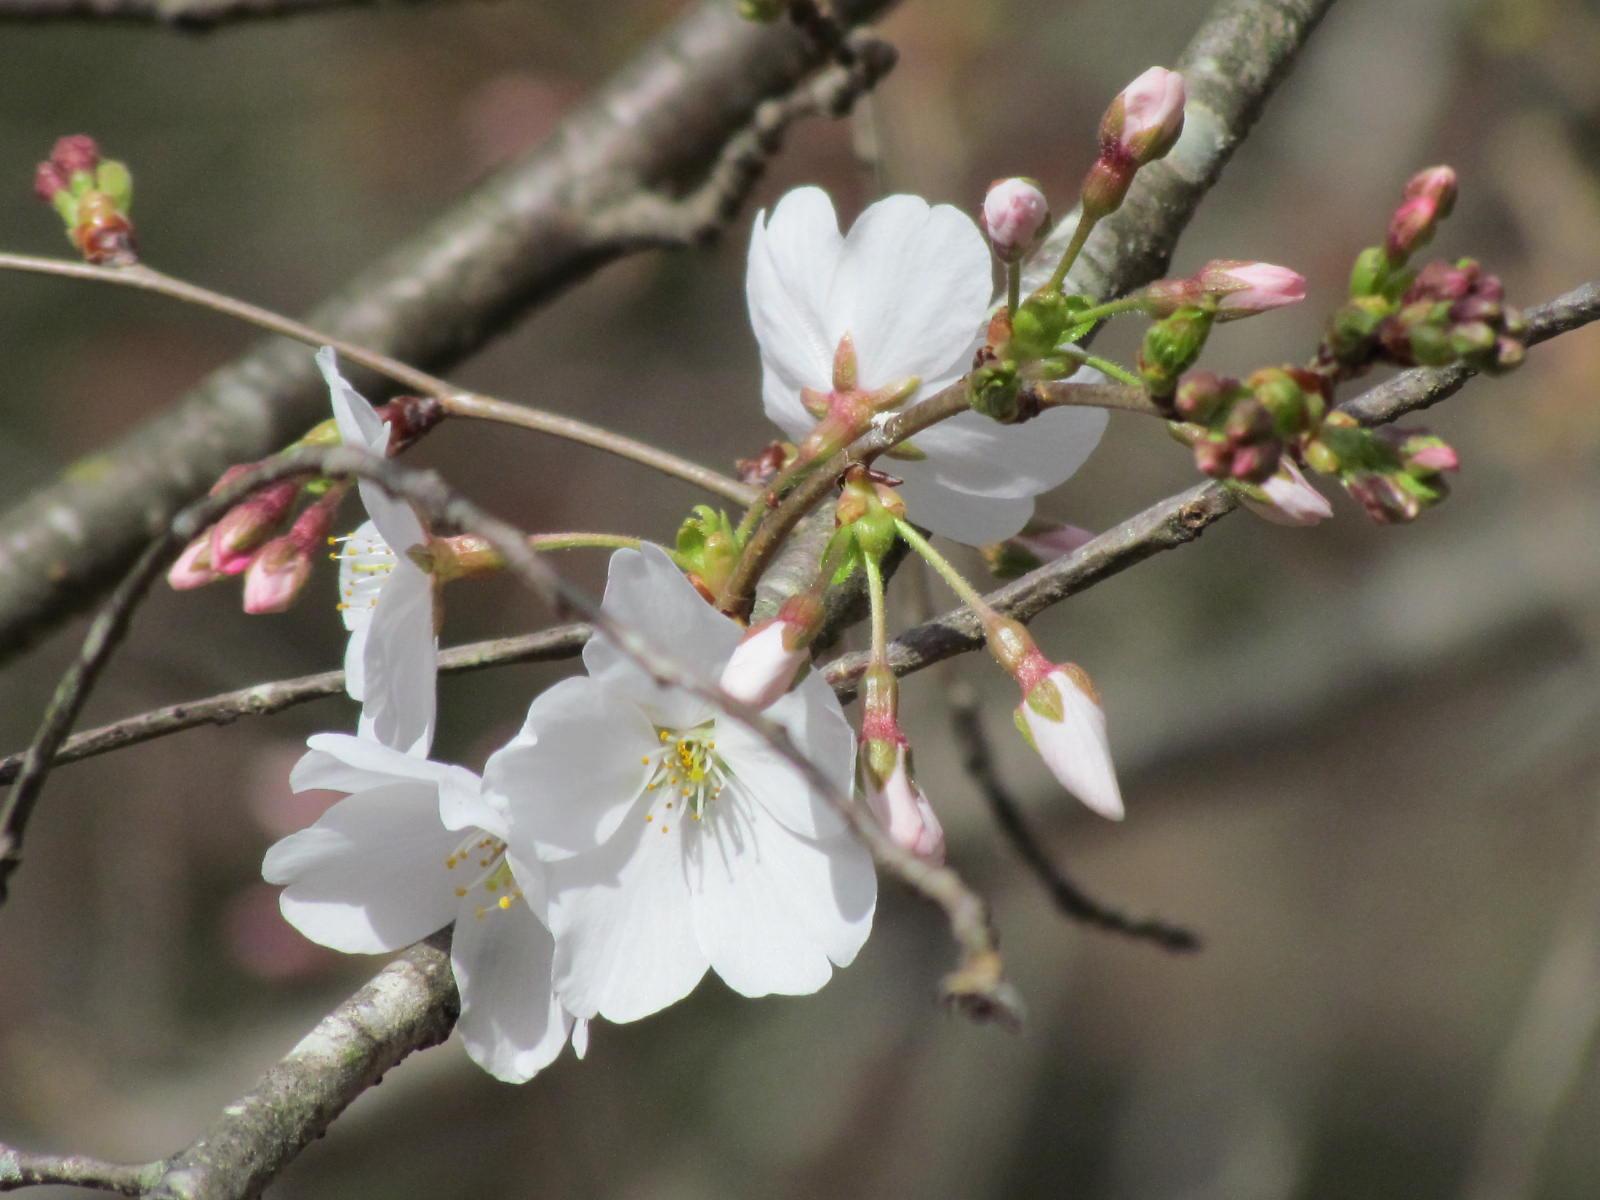 Cherry Blossoms 2 Feb 28 2017.JPG